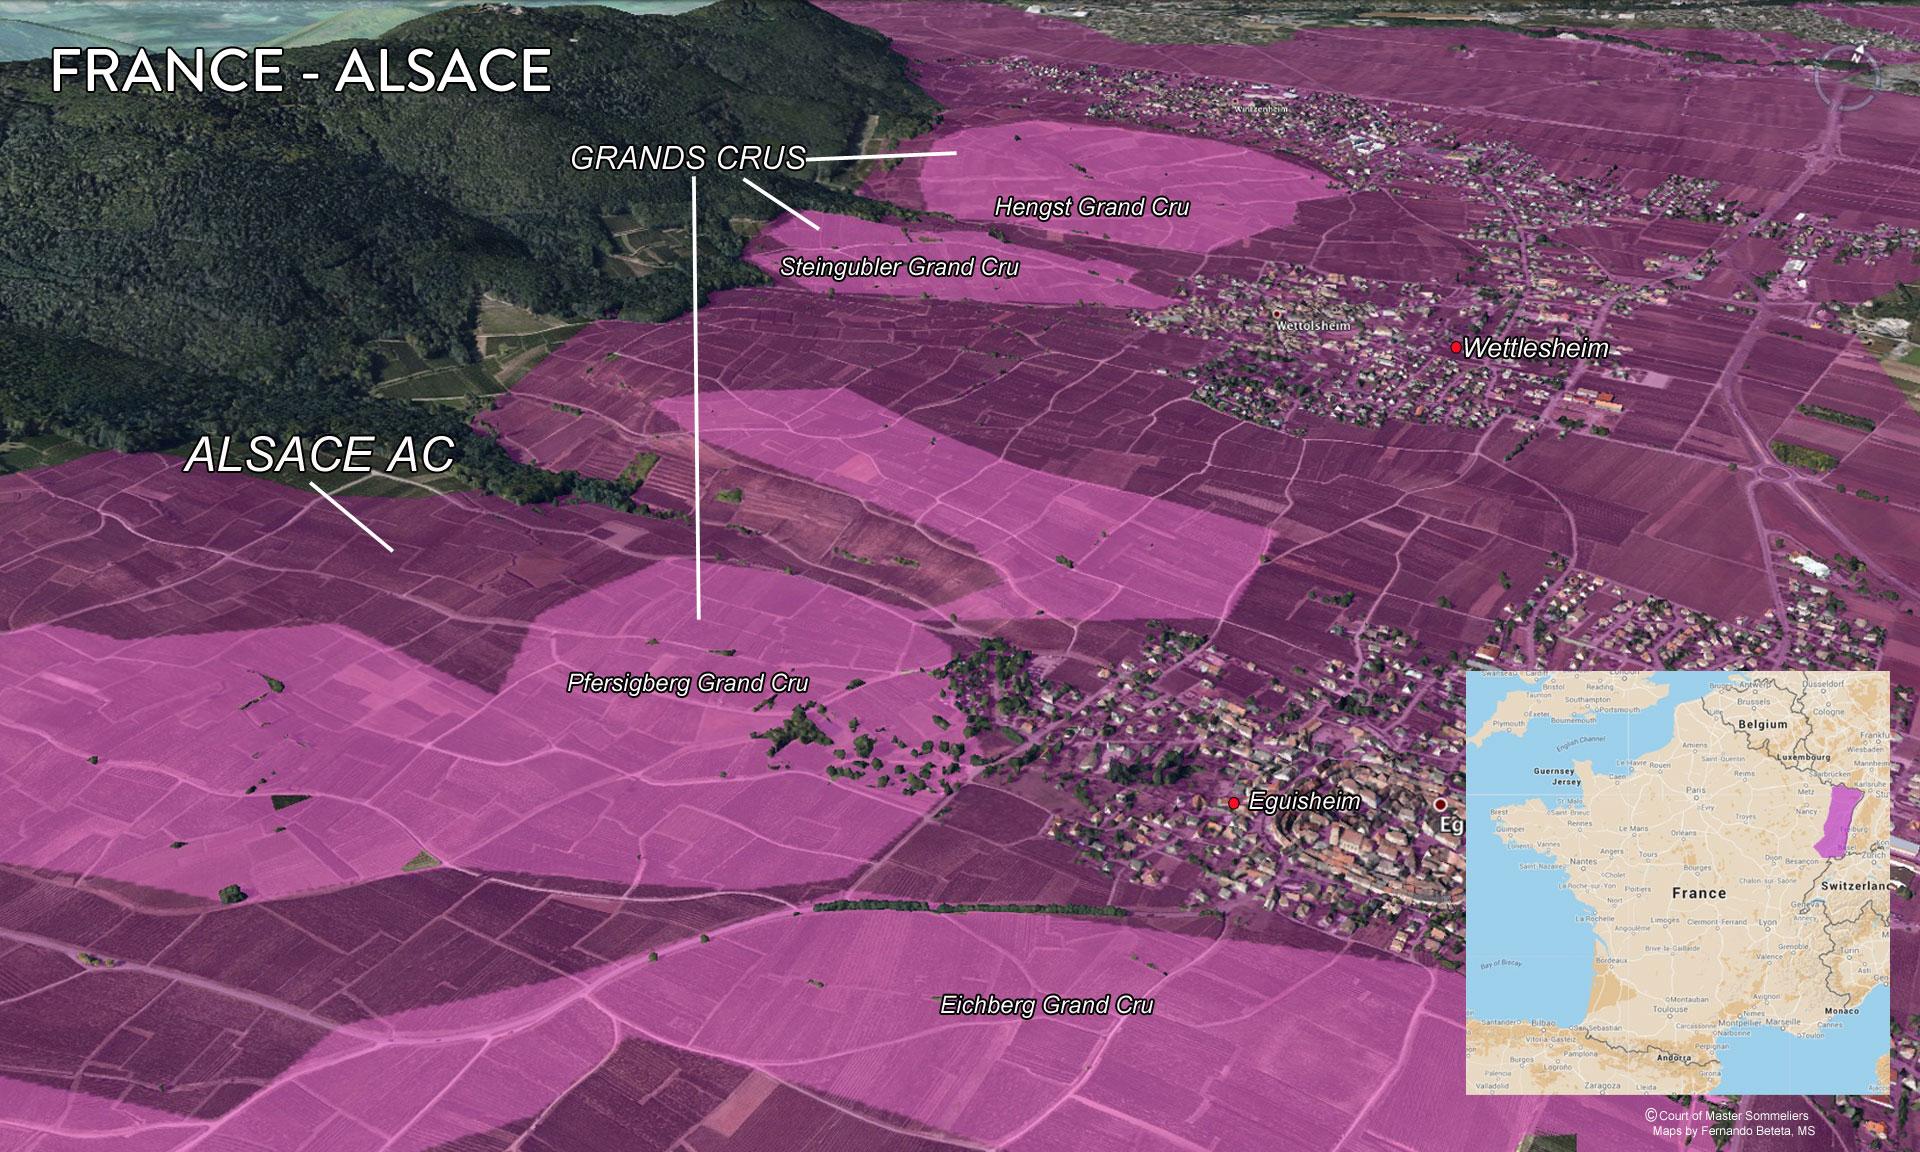 France-Alsace-Grands-Crus.jpg